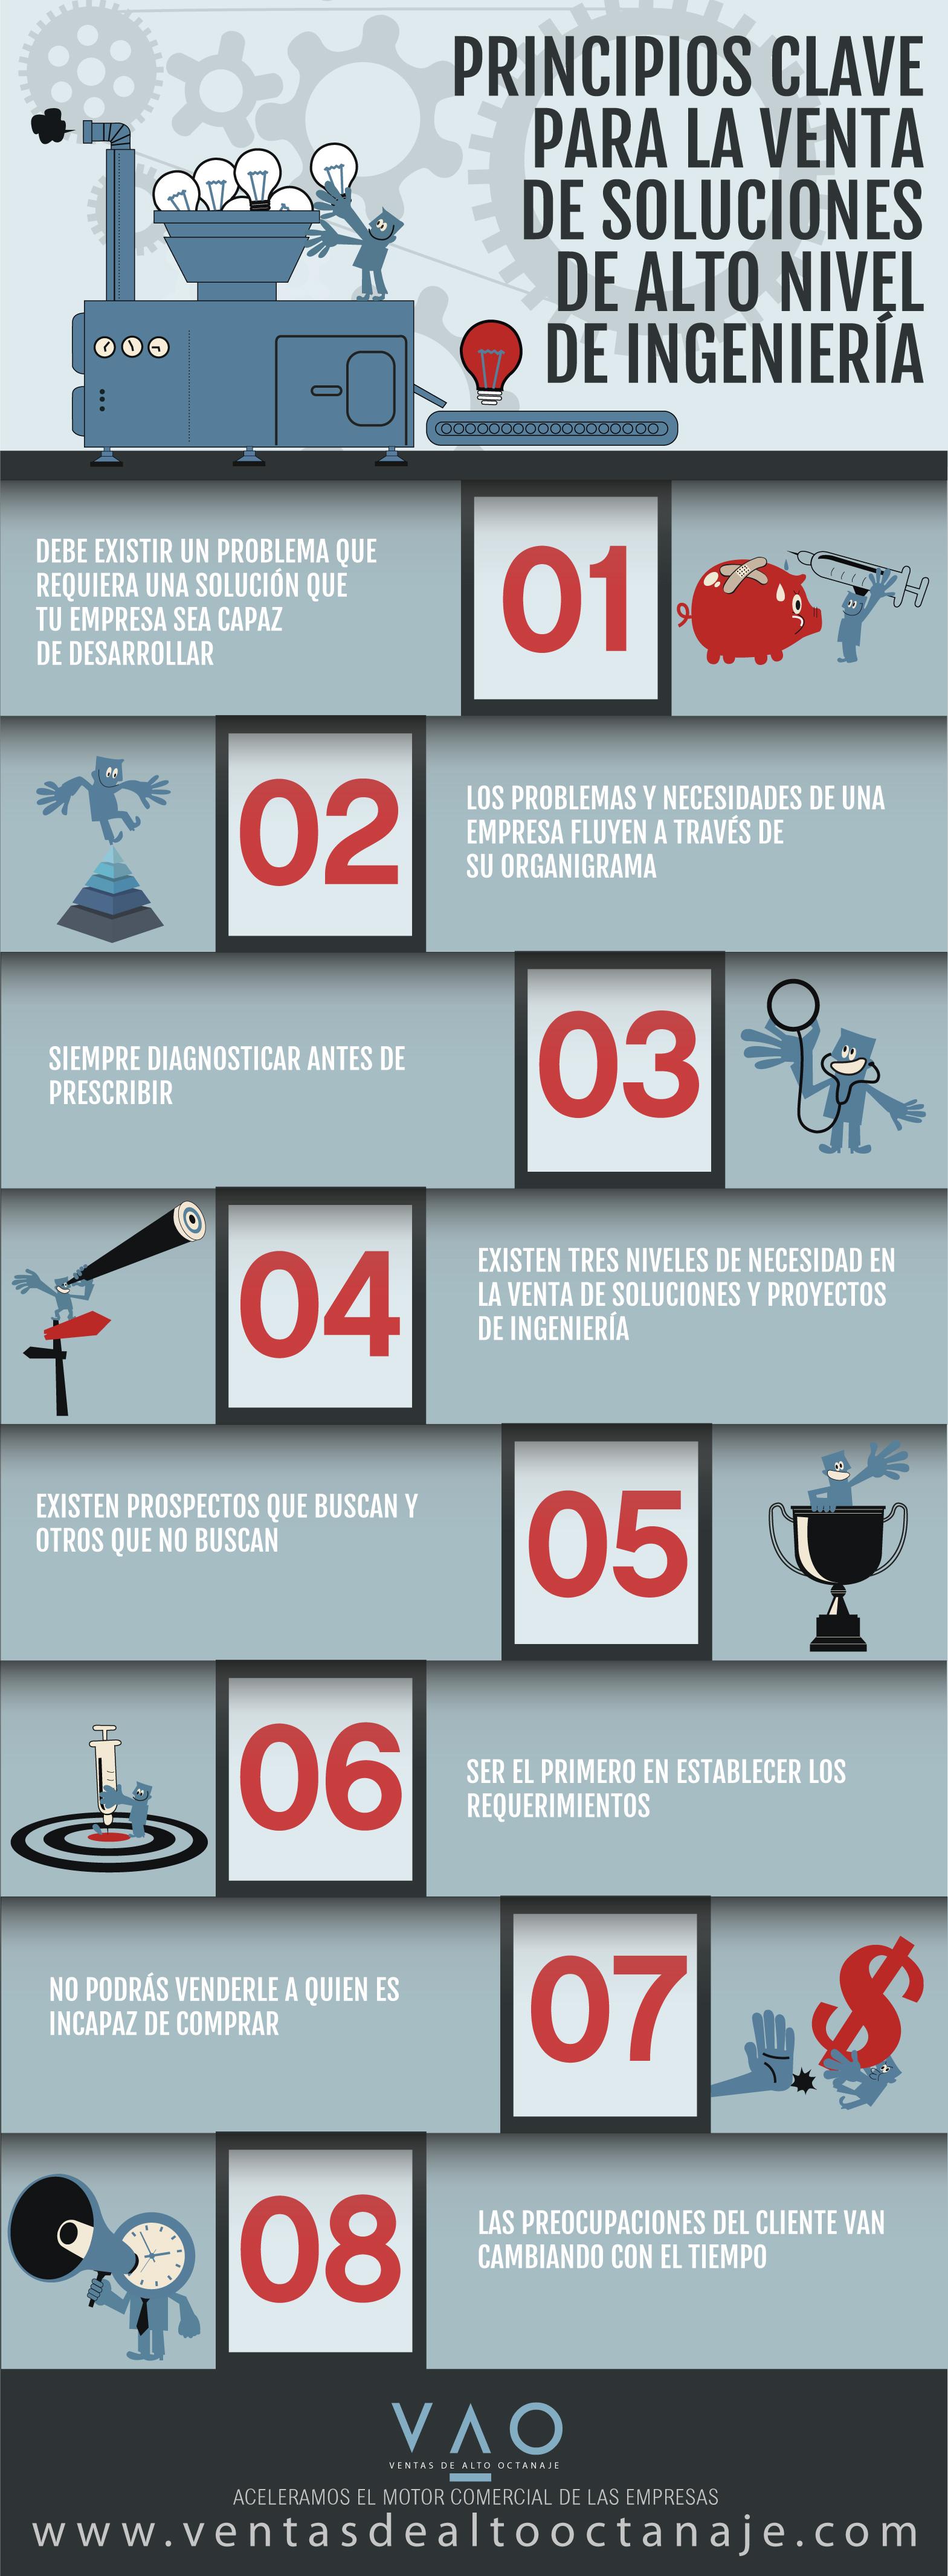 infografia-vao-principios_venta_soluciones_ingenieros